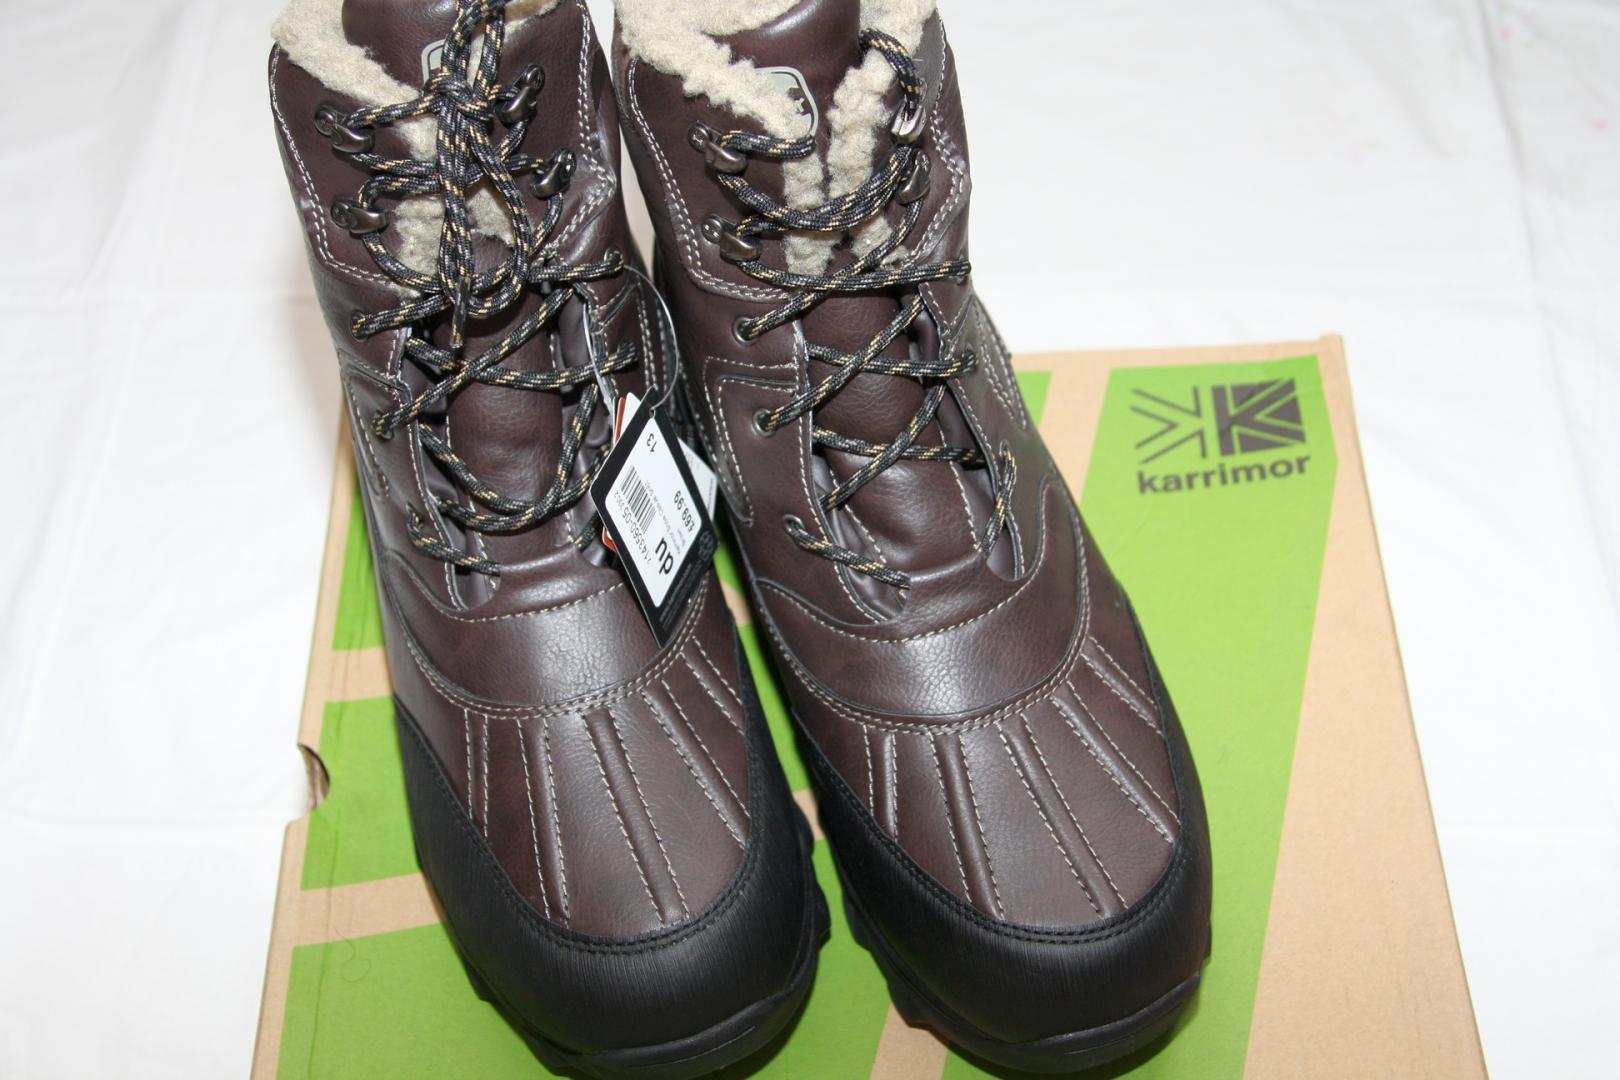 Отзыв на Karrimor Casual для мужчин зимние ботинки из Интернет-Магазина Sports Direct